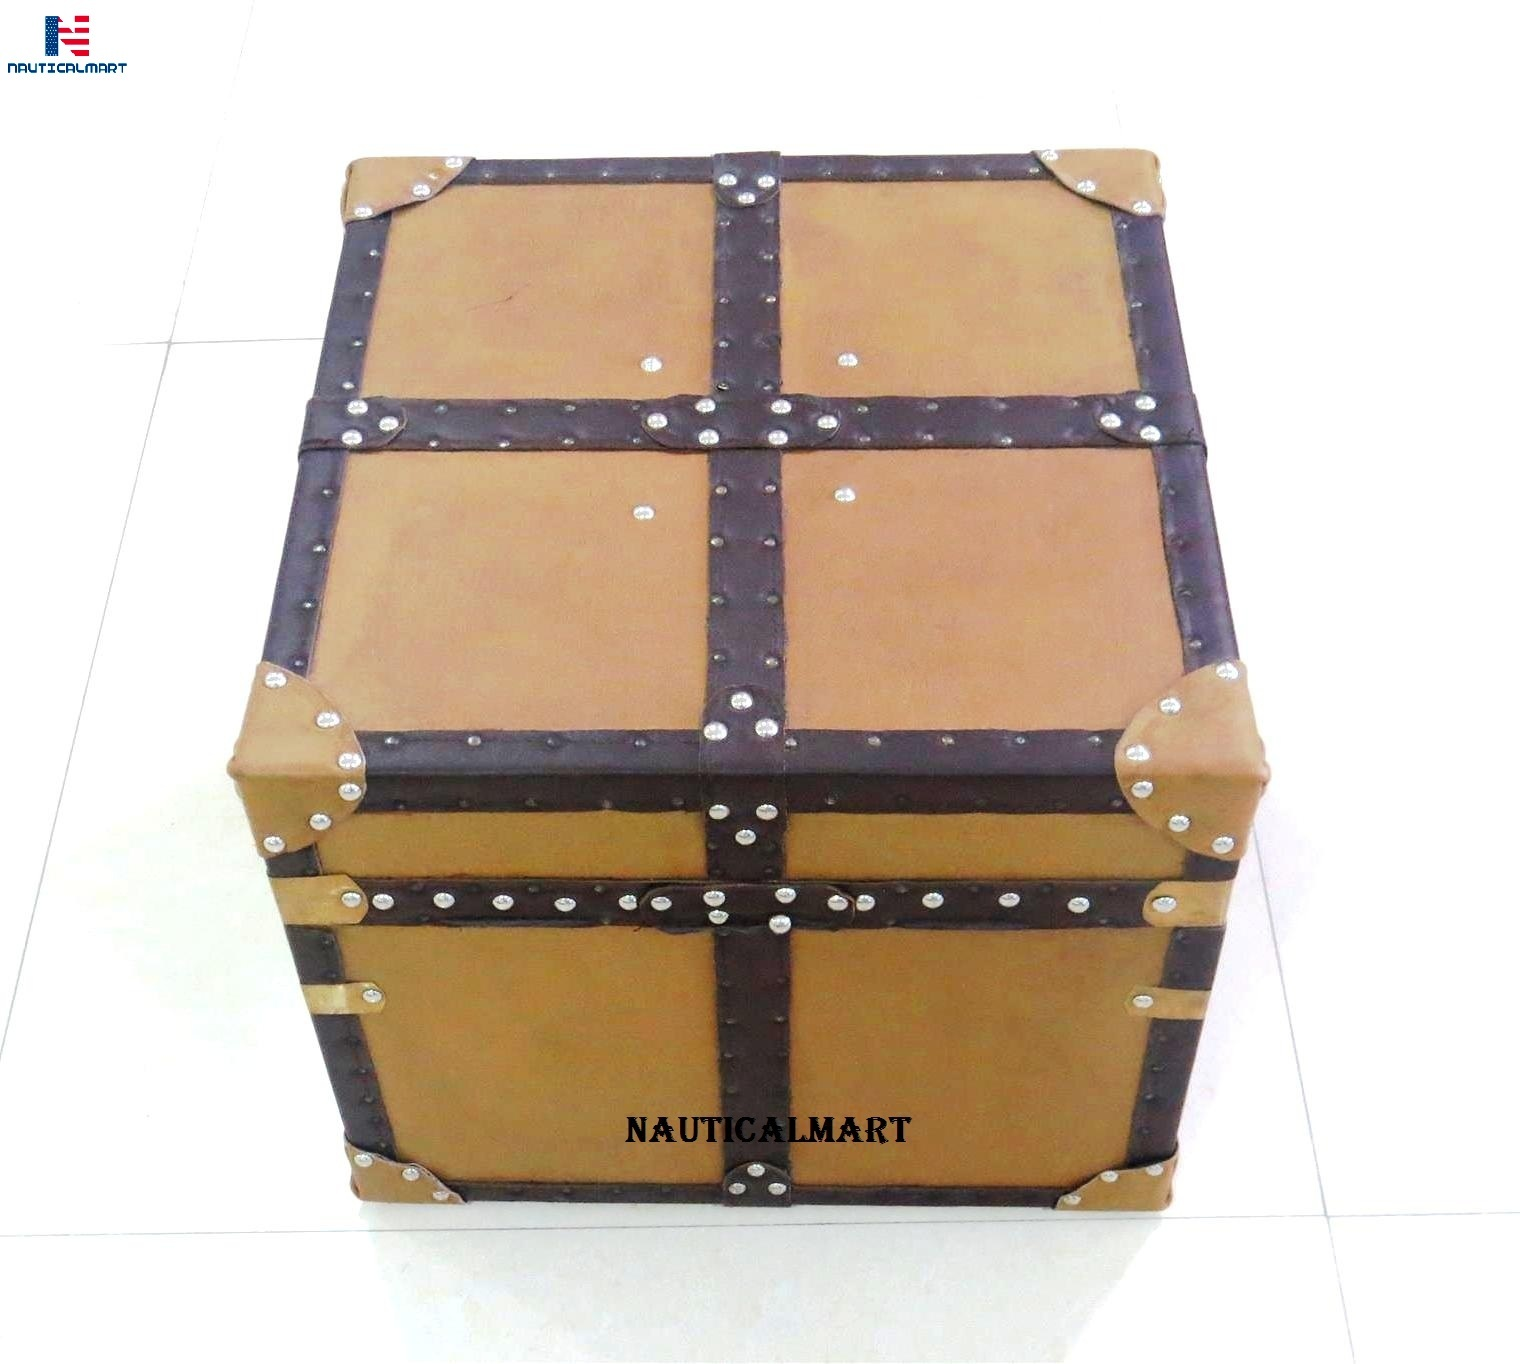 NauticalMart Aviator Mayfair Leather Trunk Coffee Table